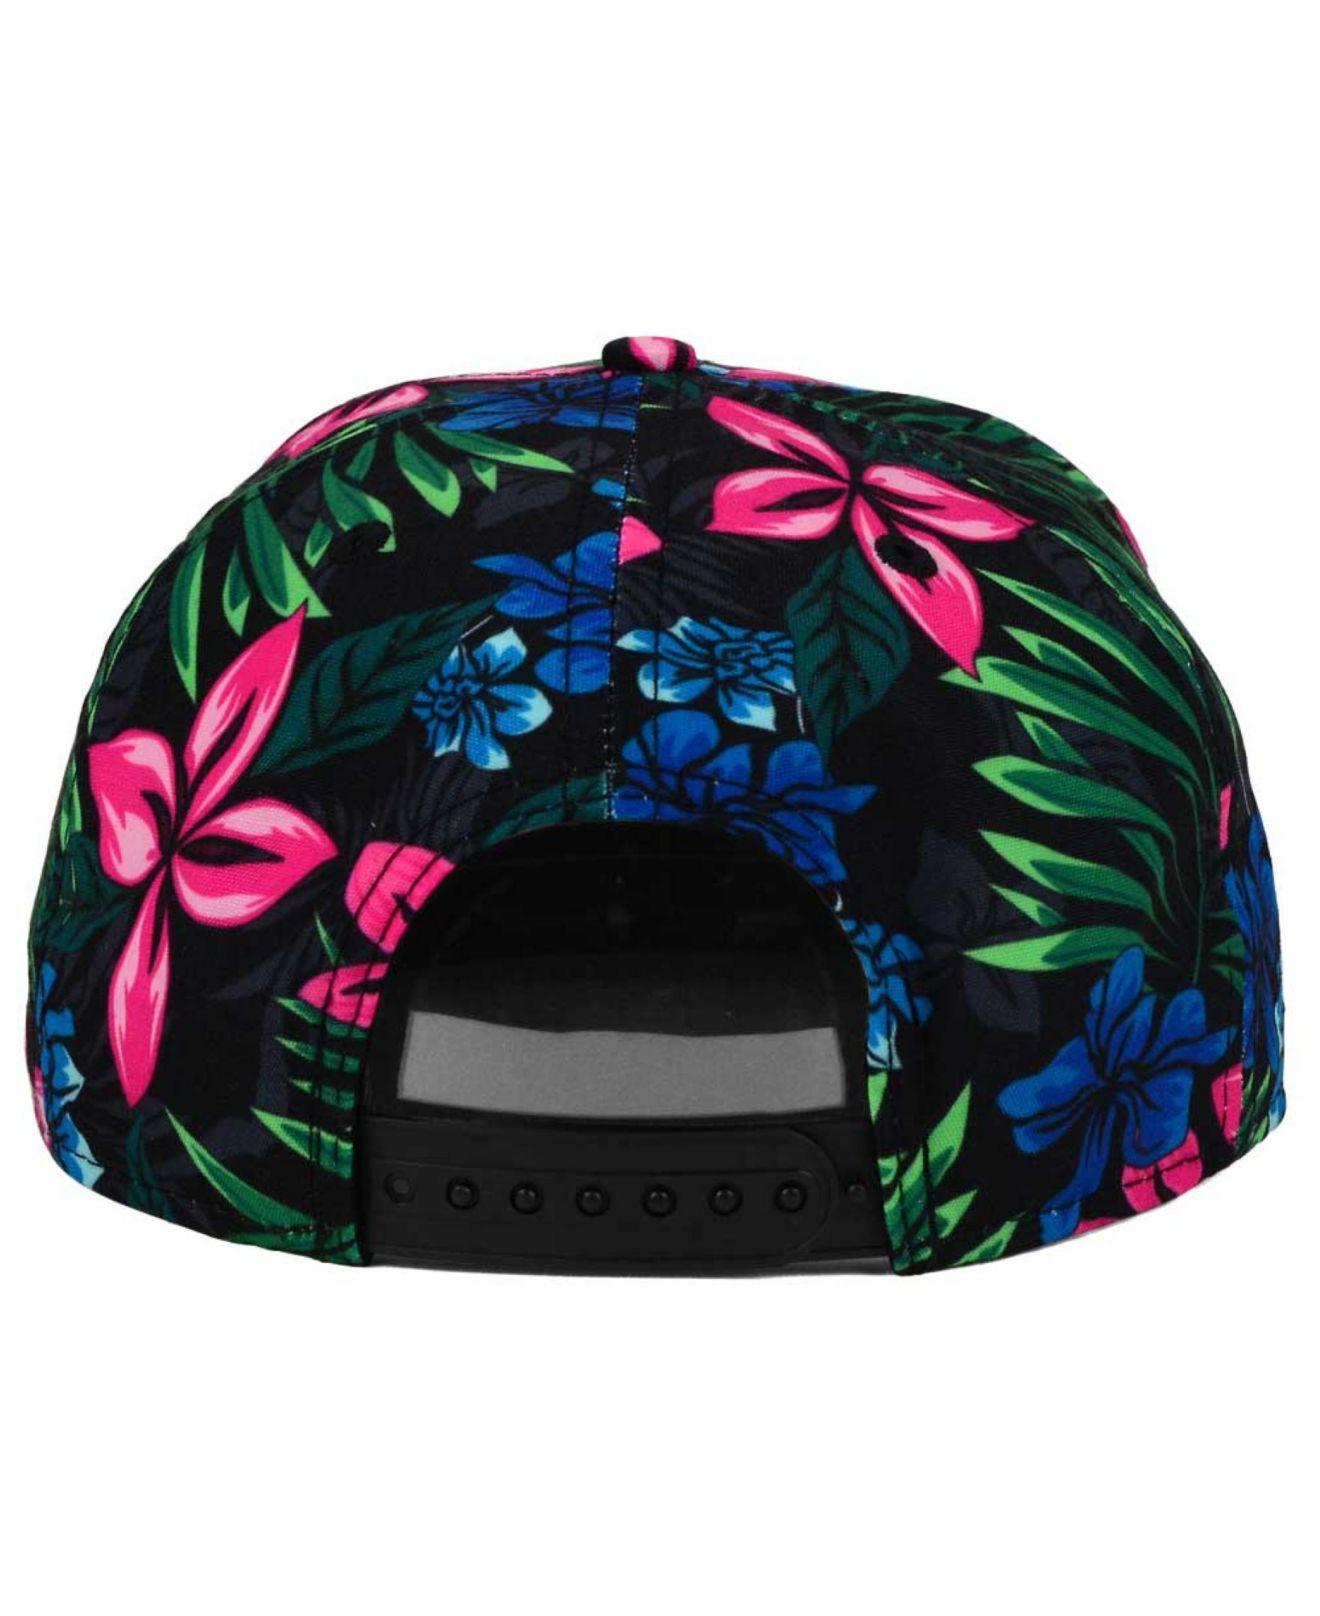 quality design 24ae9 9a981 ... reduced lyst ktz new york knicks shadow floral 9fifty snapback cap in  00868 303f6